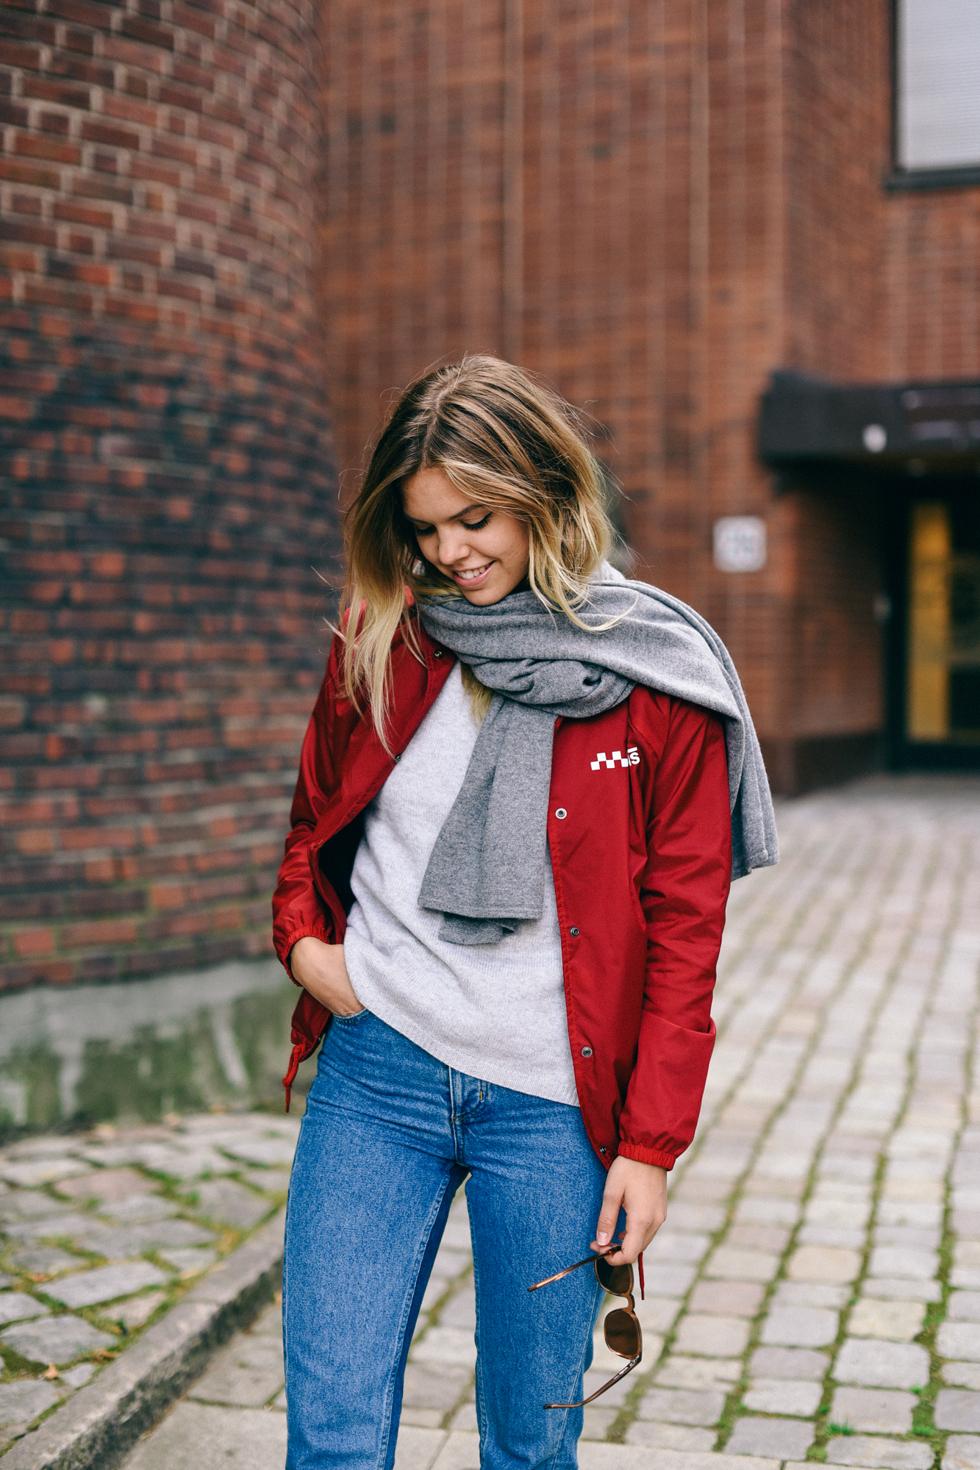 outfit soft goat flora wiström, @florawis, flora.metromode.se